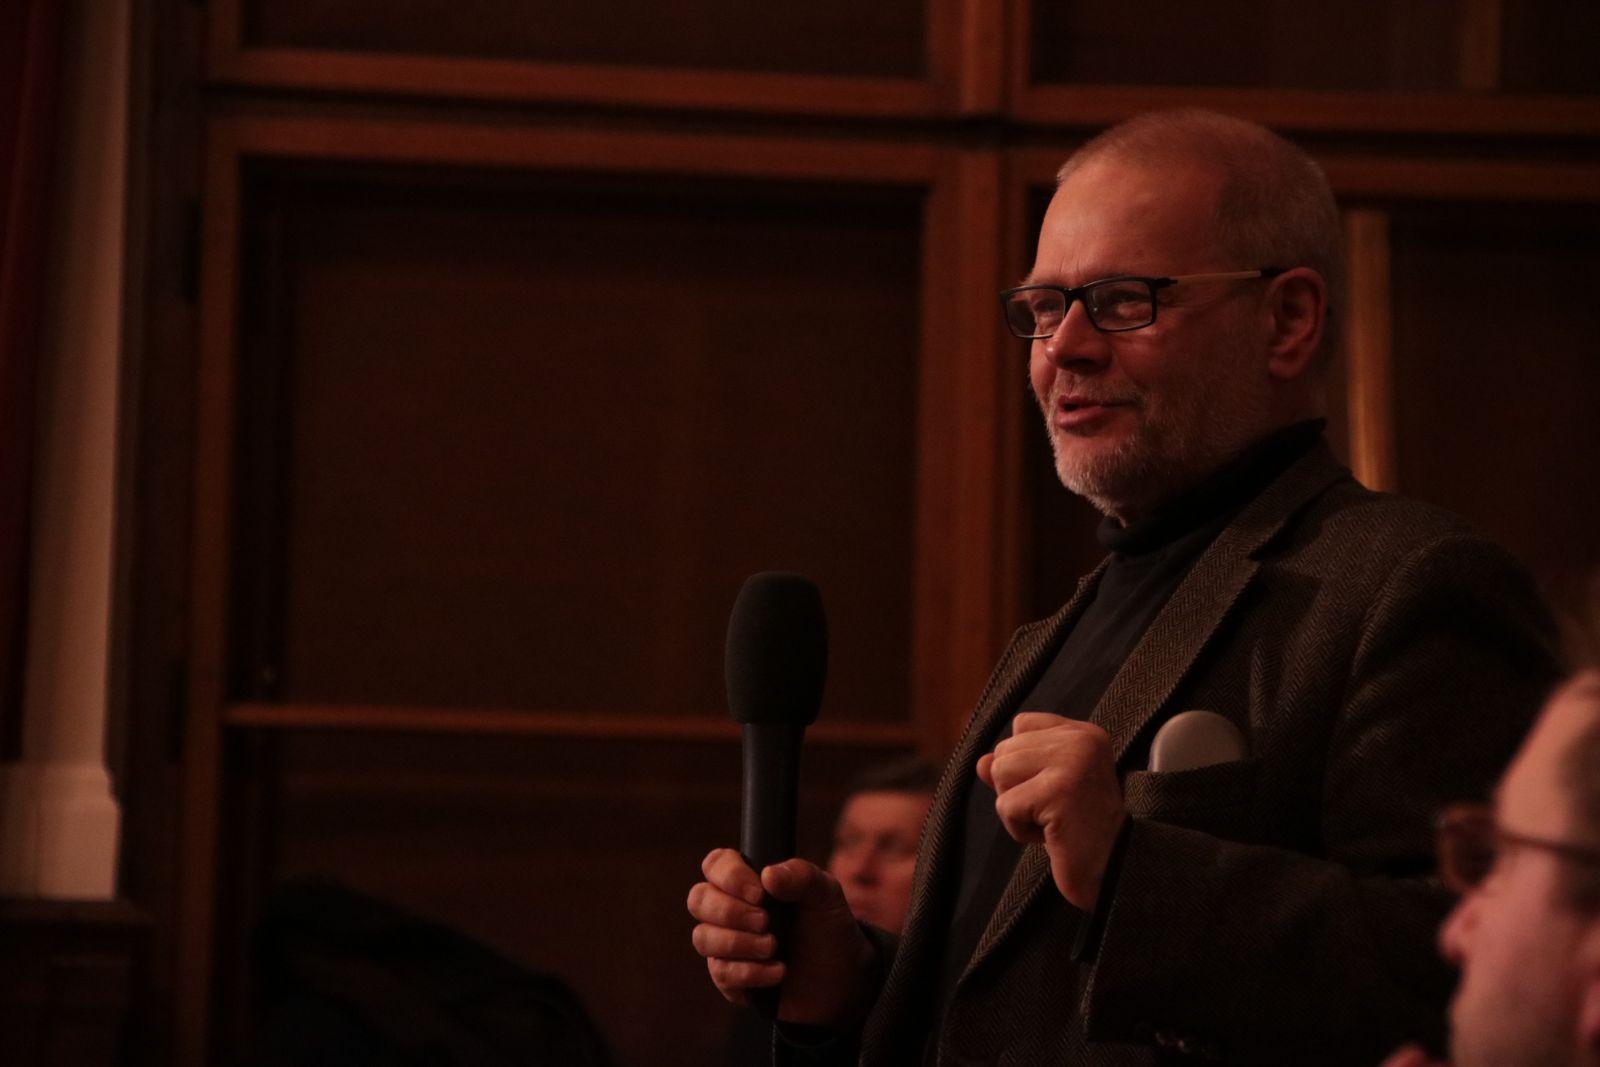 prof. Krzysztof Podemski